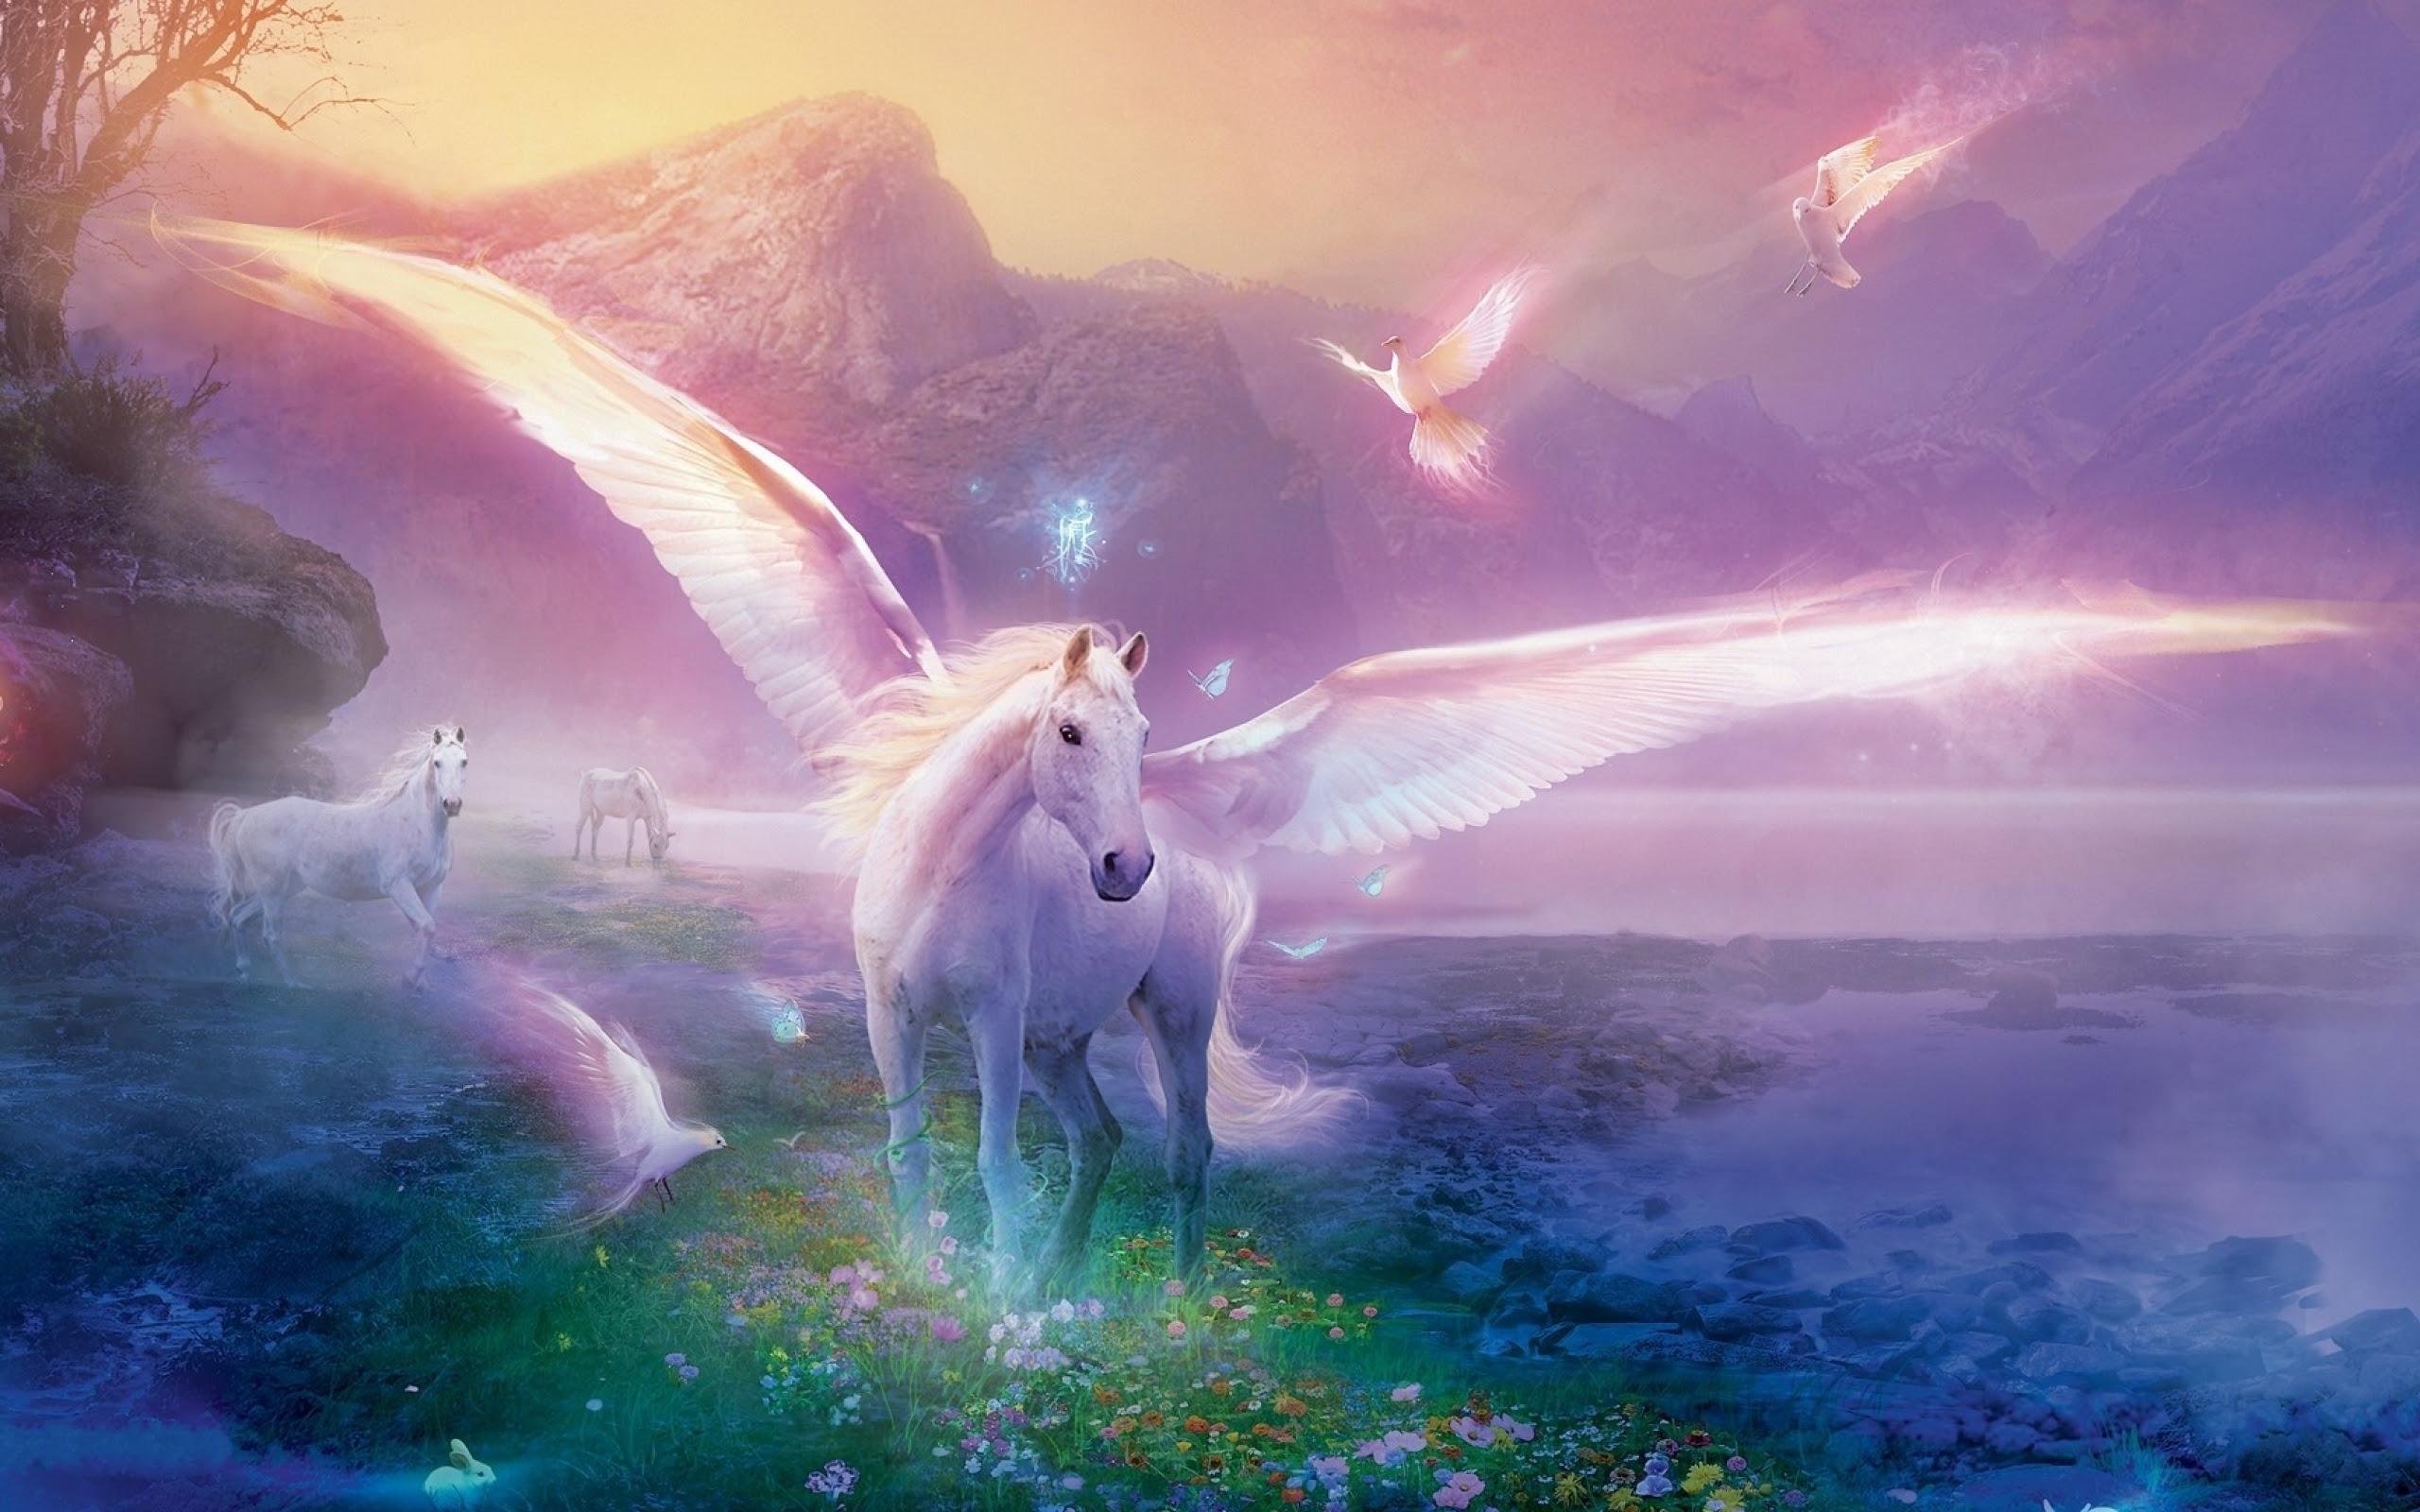 Wallpaper Hd Unicorn